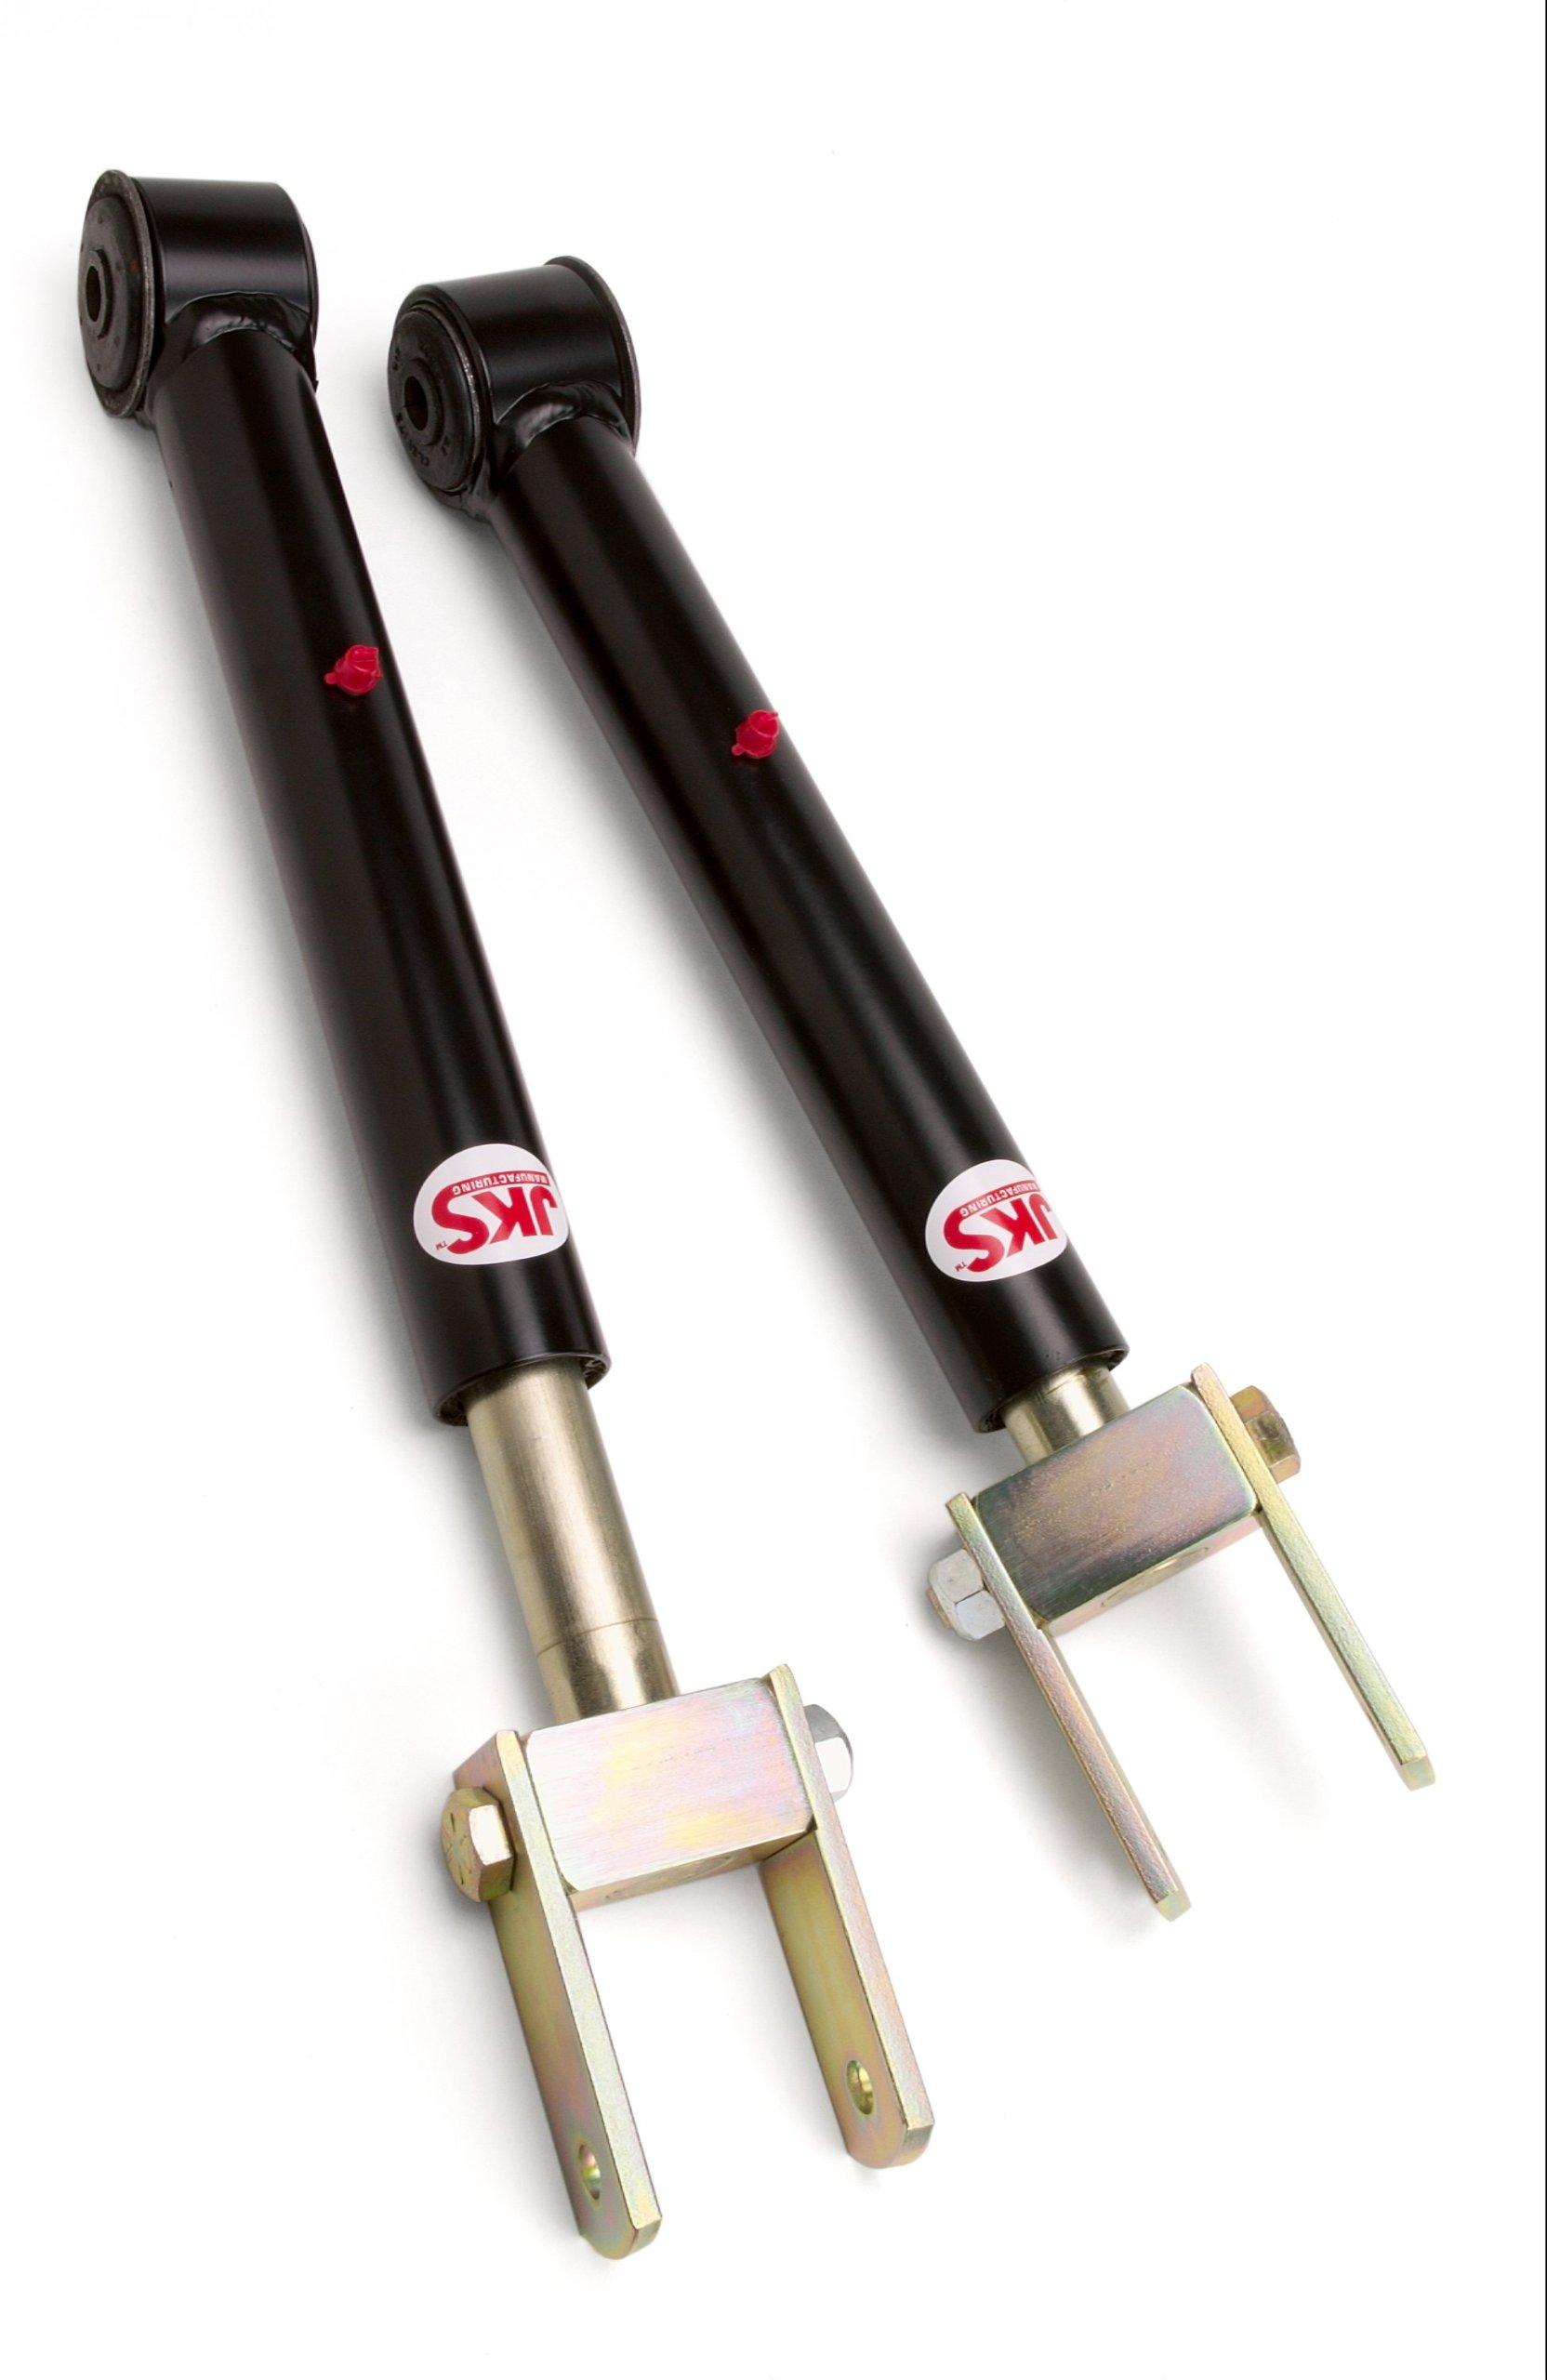 JKS 7100 Control Arm by JKS (Image #1)